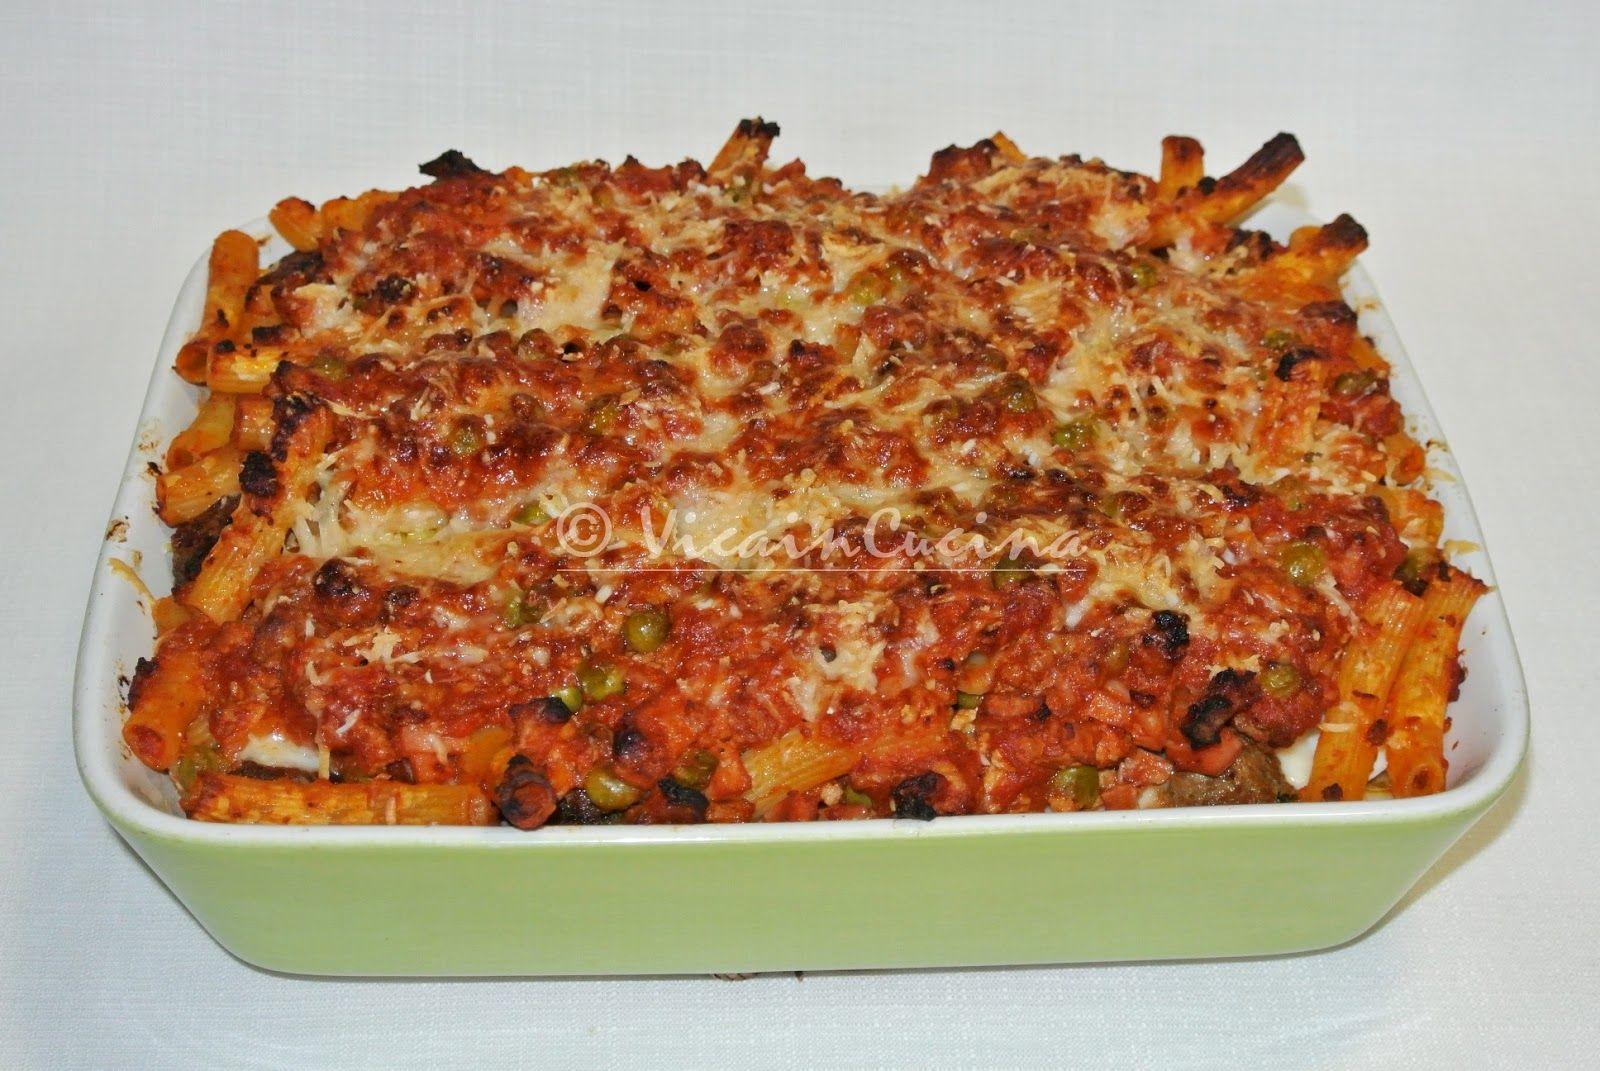 4c09f5afe1a29b0f21a4b9b73deba5f5 - Paste Al Forno Ricette